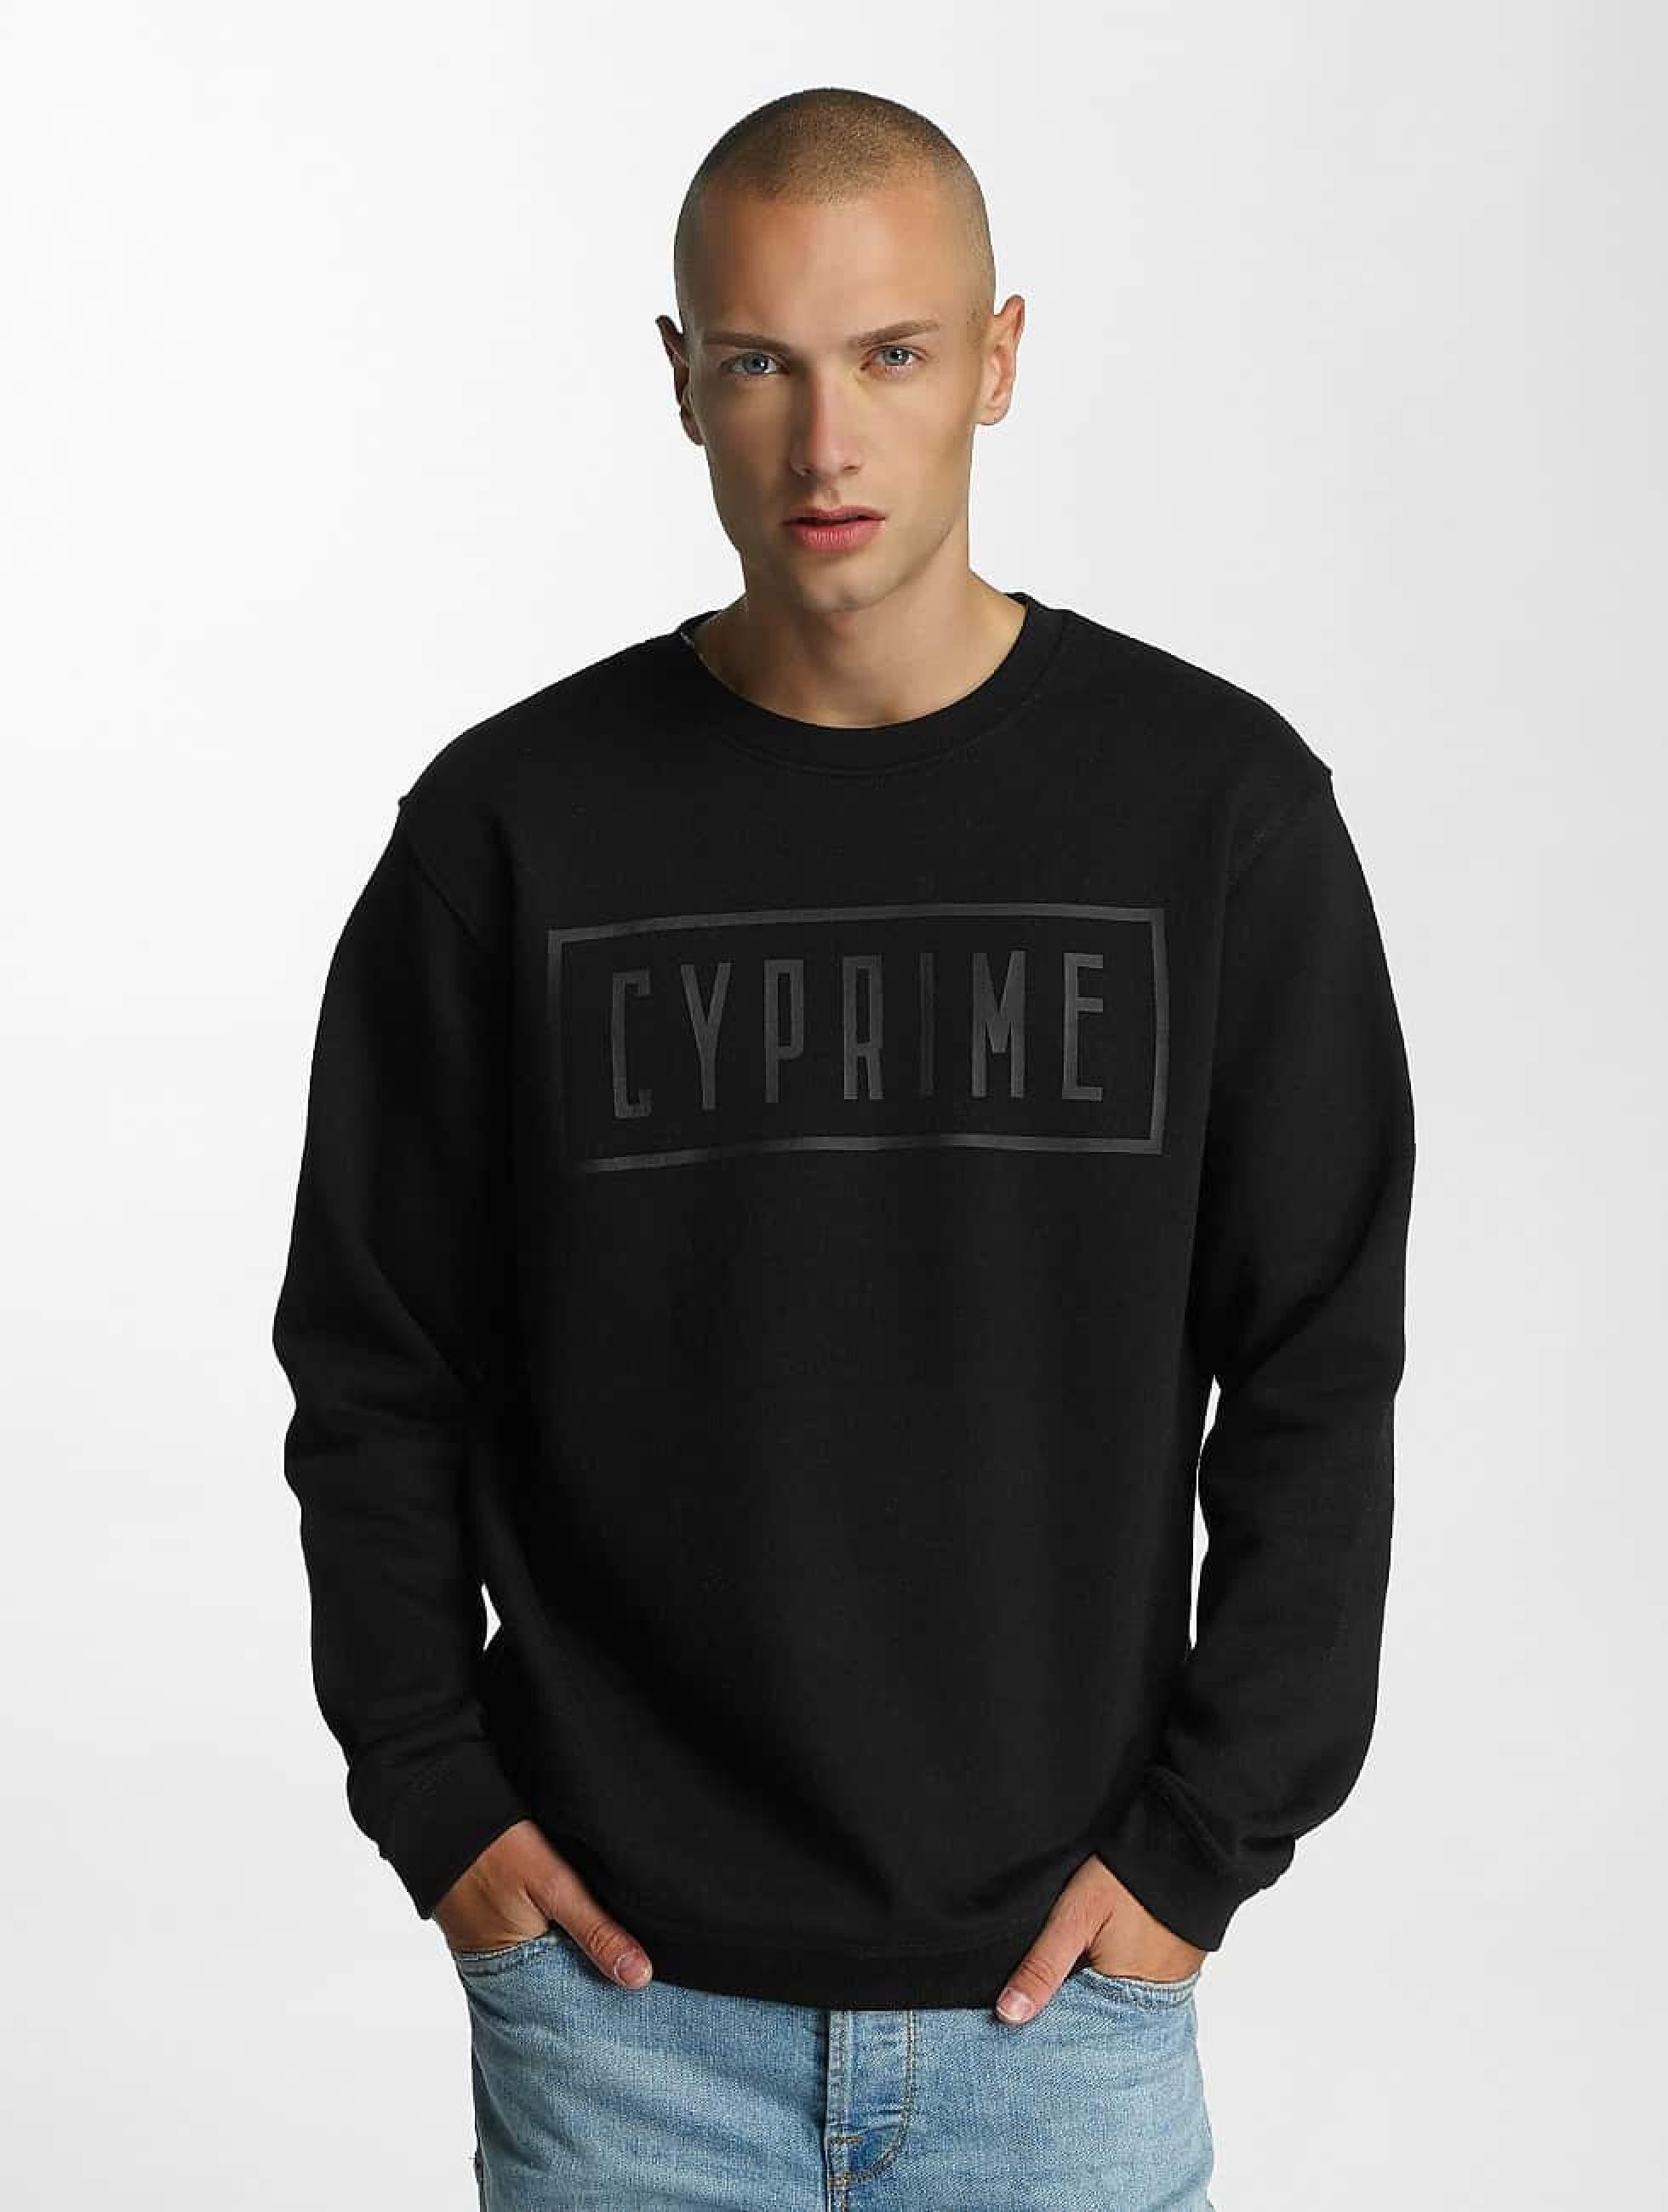 Cyprime / Jumper Zirconium in black M